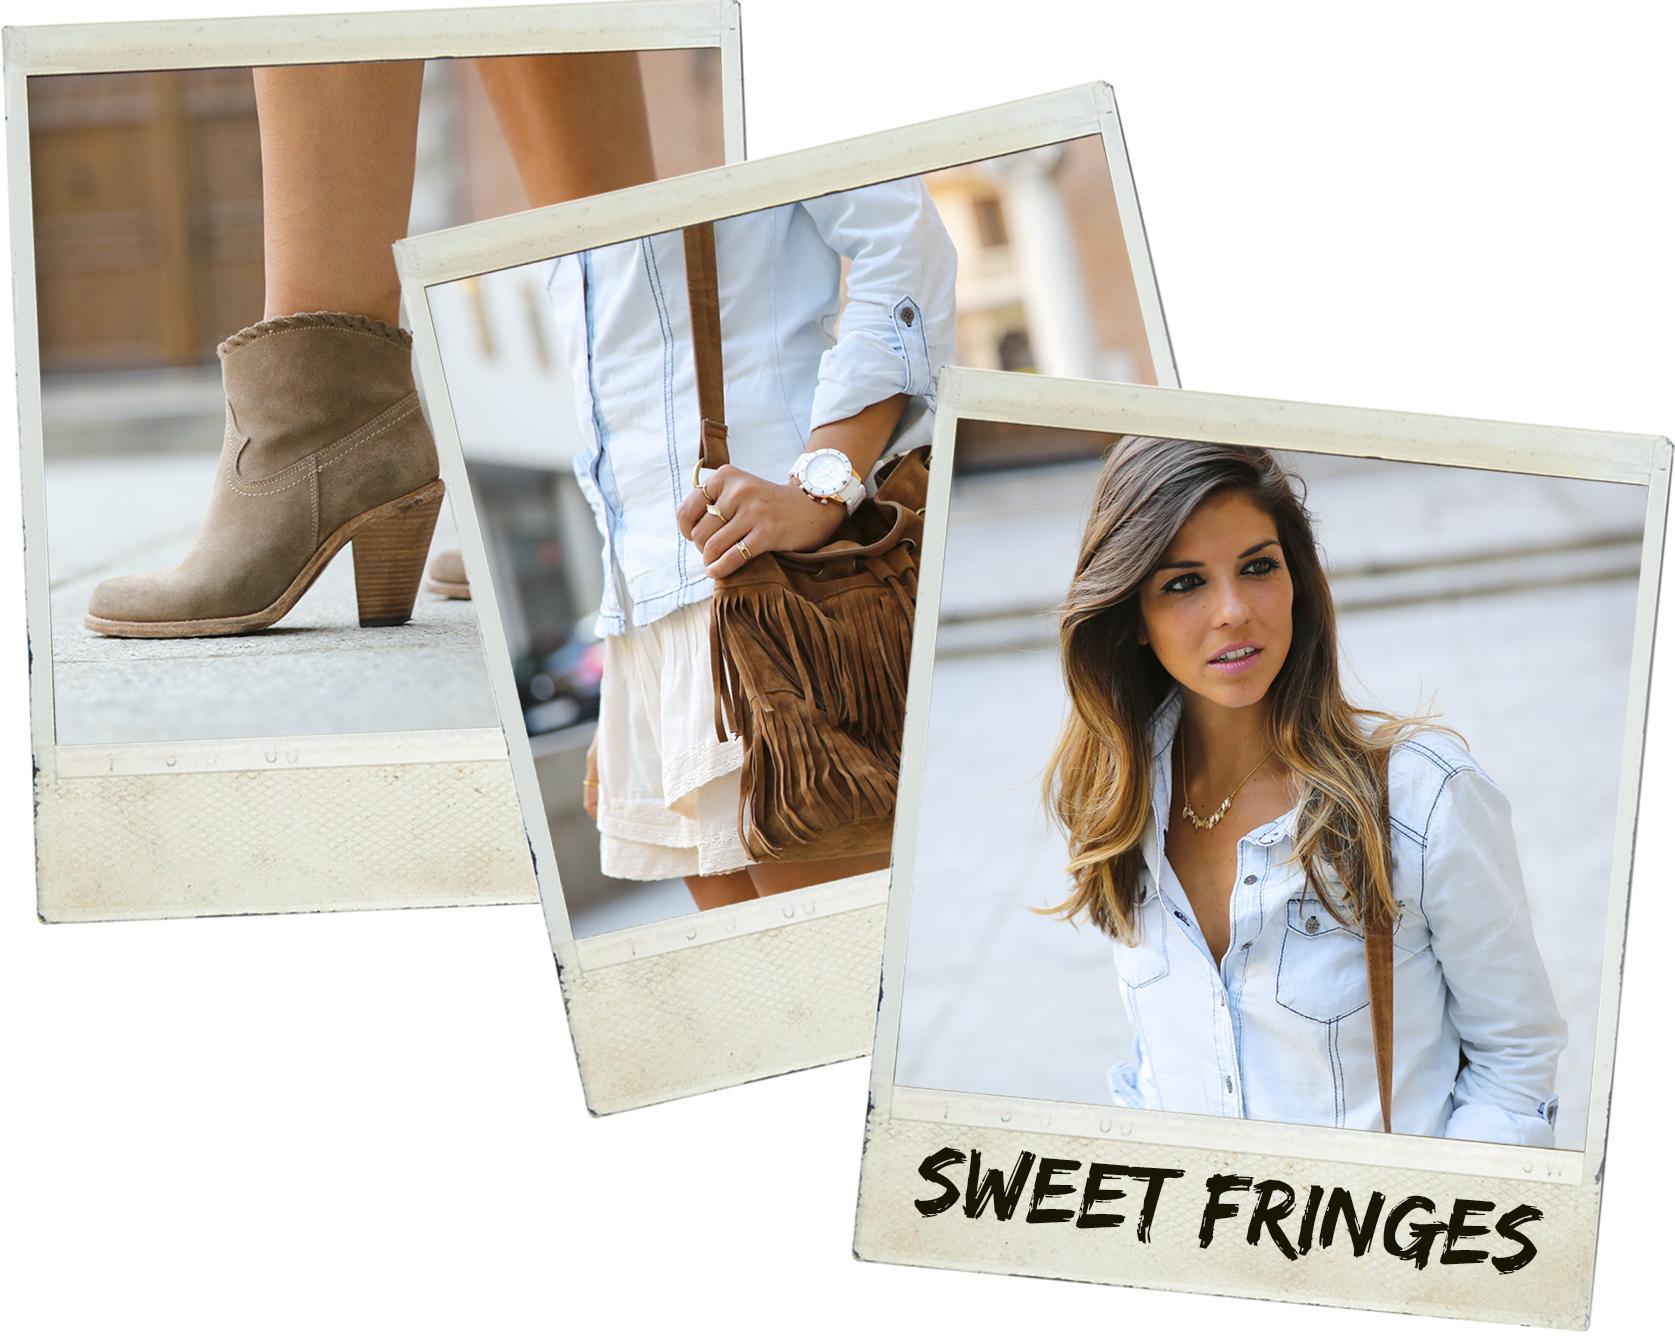 trendy_taste-look-outfit-street_style-denim-blog-blogger-fashion_spain-moda_españa-botines_camperos-it_shoes-cowboy_booties-skirt-falda-bolso_flecos-fringes_bag-camisa_vaquera-denim_shirt-polaroid